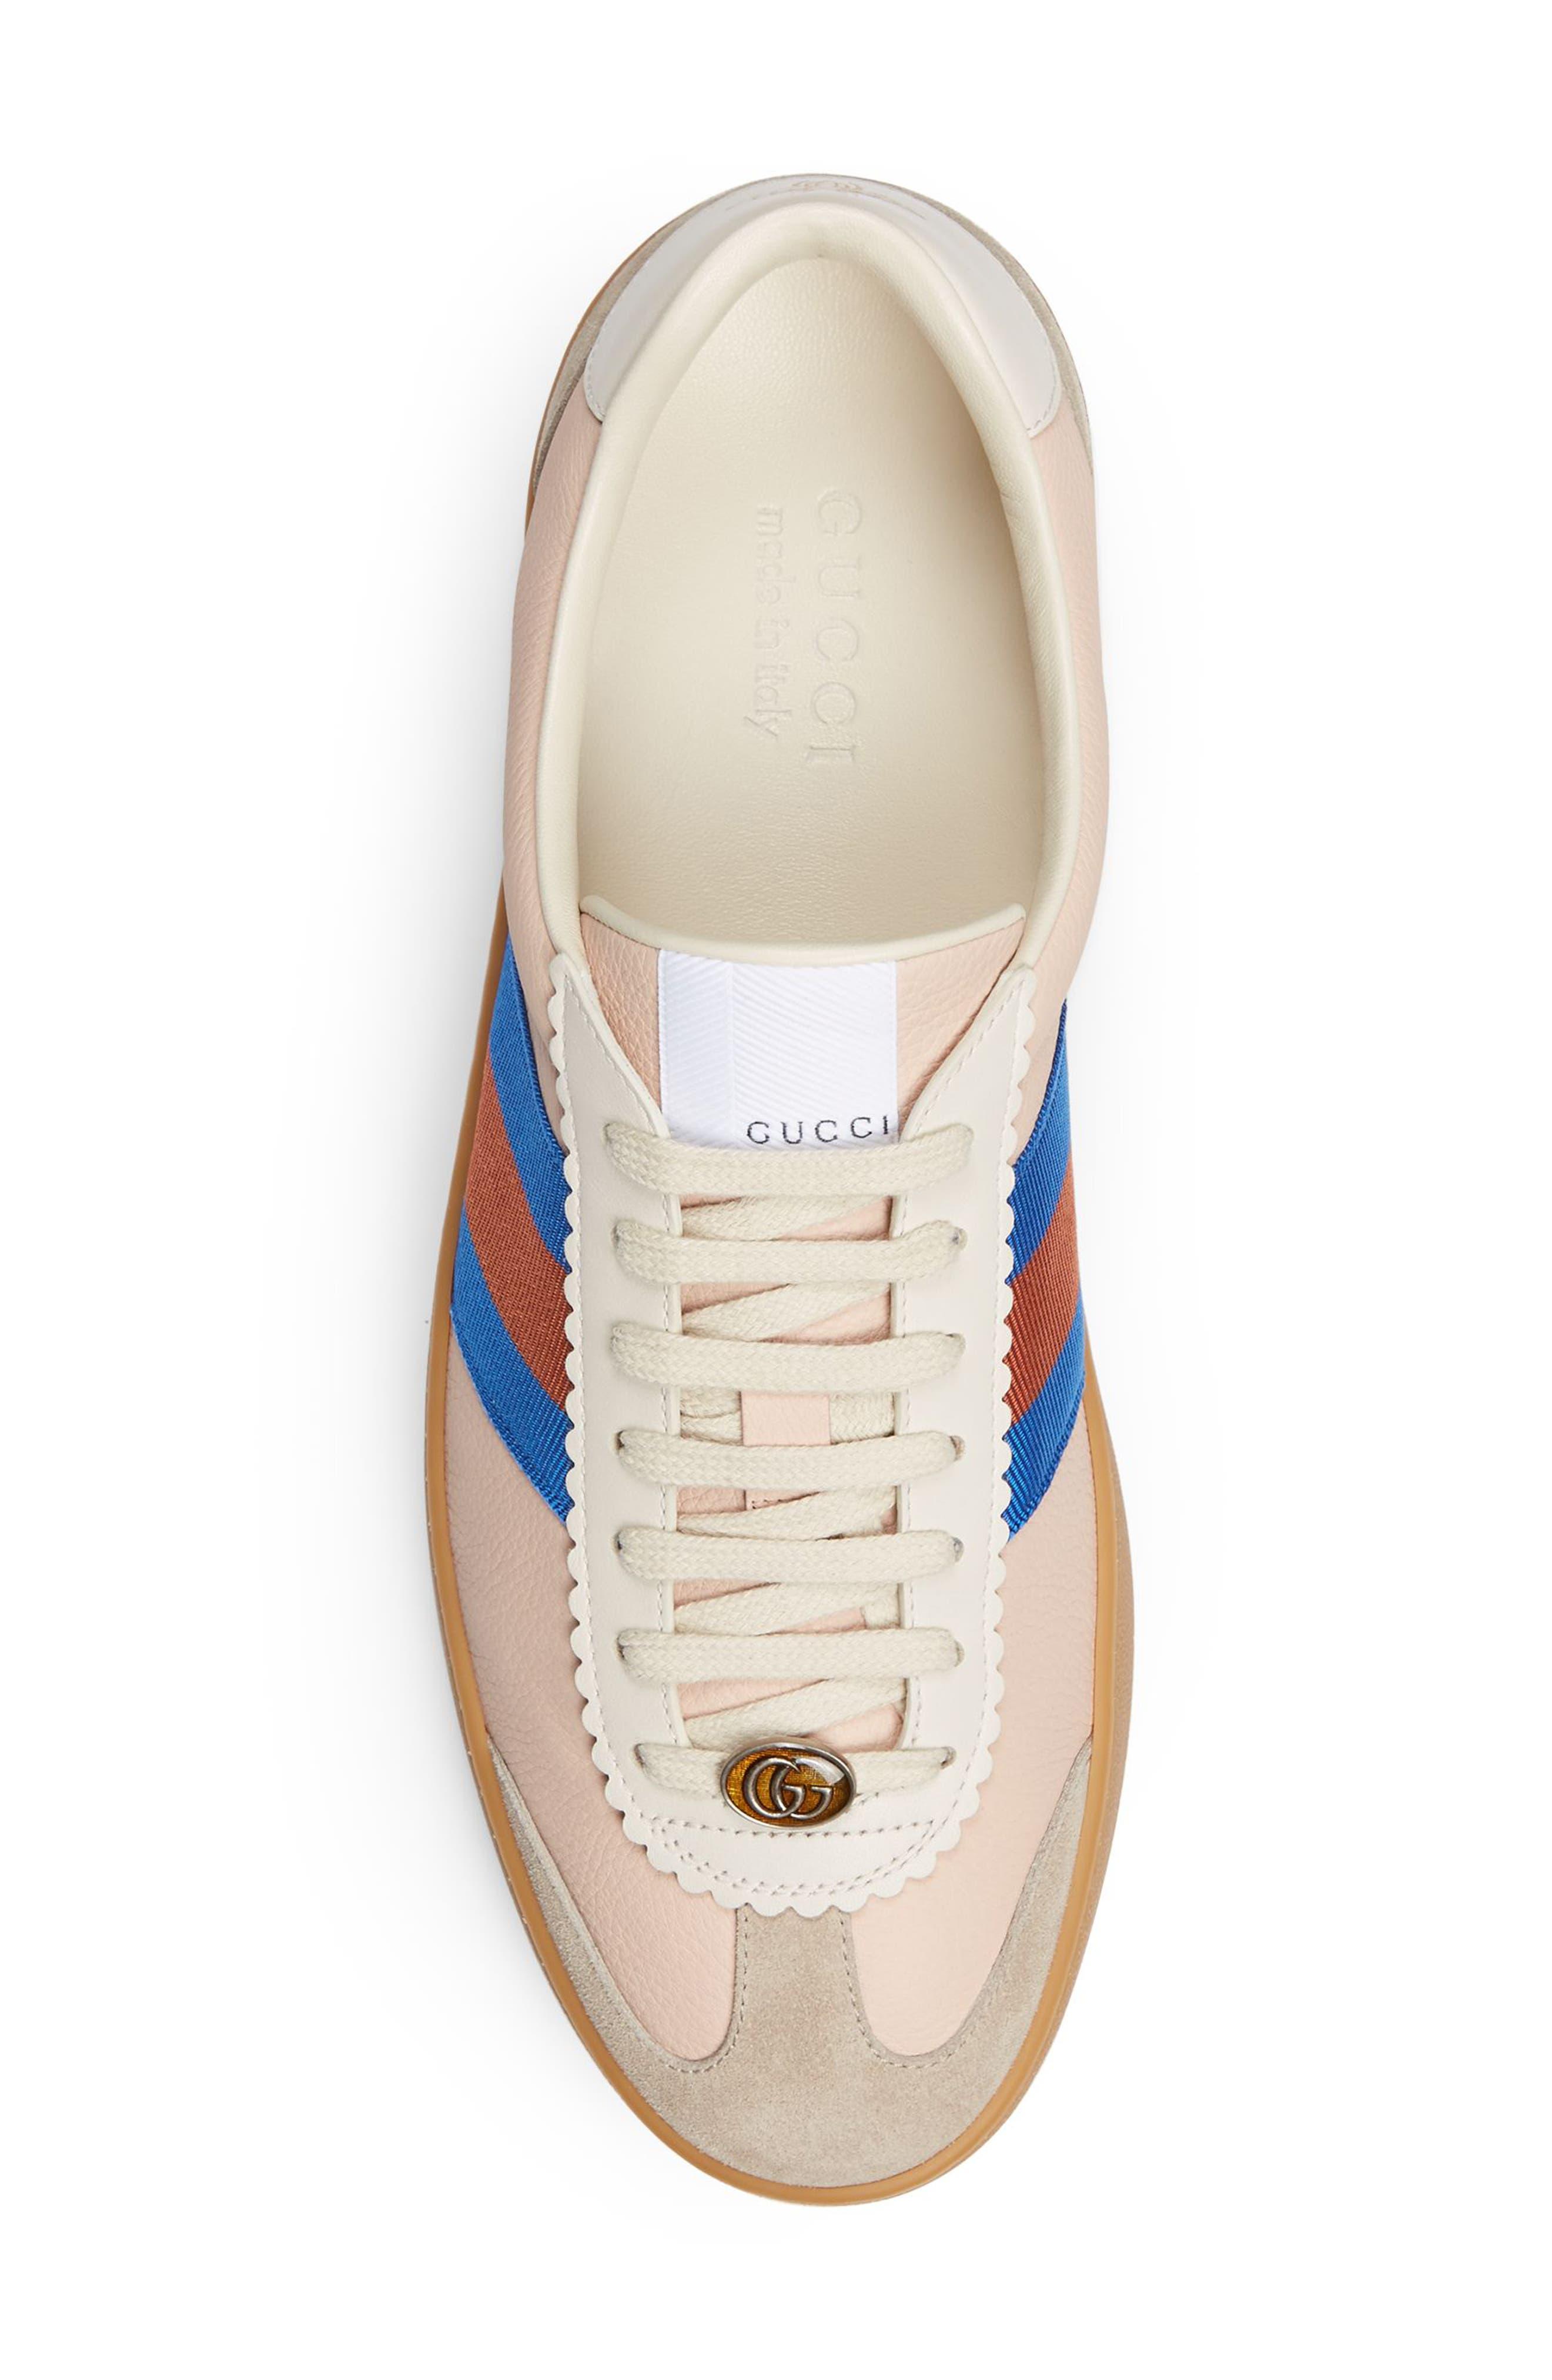 JBP Retro Gum Sole Sneaker,                             Alternate thumbnail 3, color,                             Oatmeal/ White